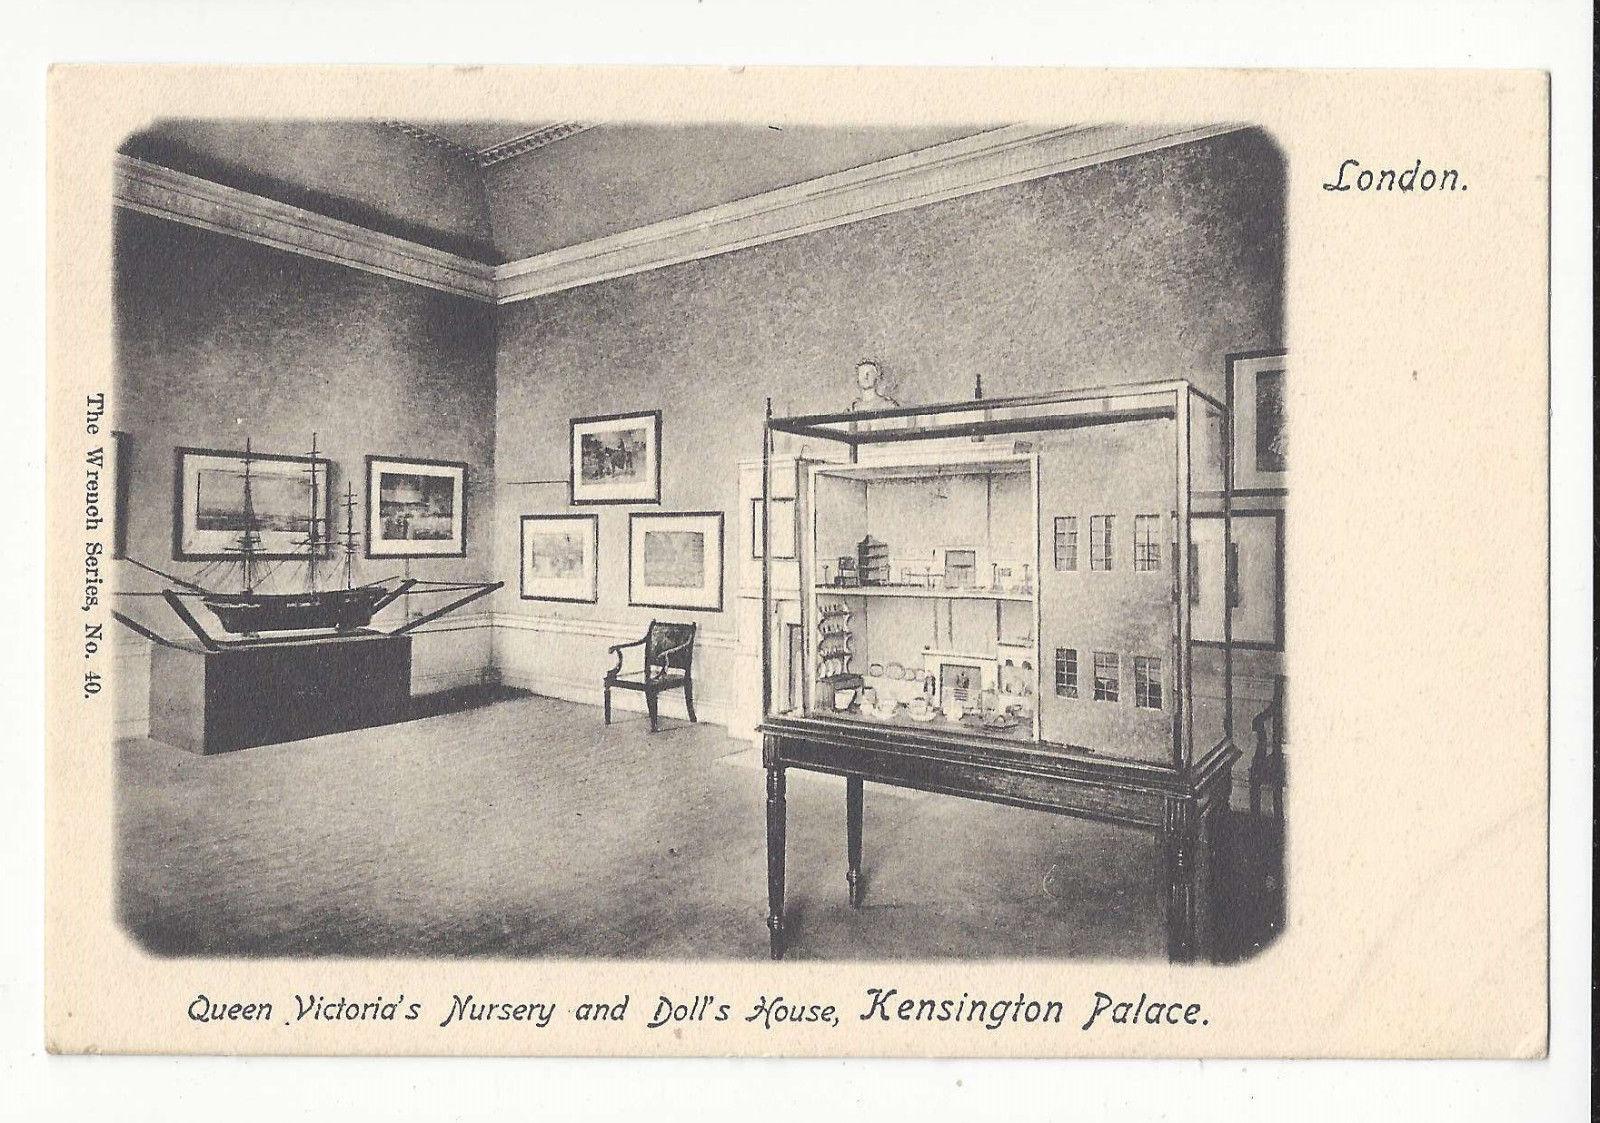 UK England Kensington Palace Queen Victorias Nursery Doll House Vtg UDB Postcard